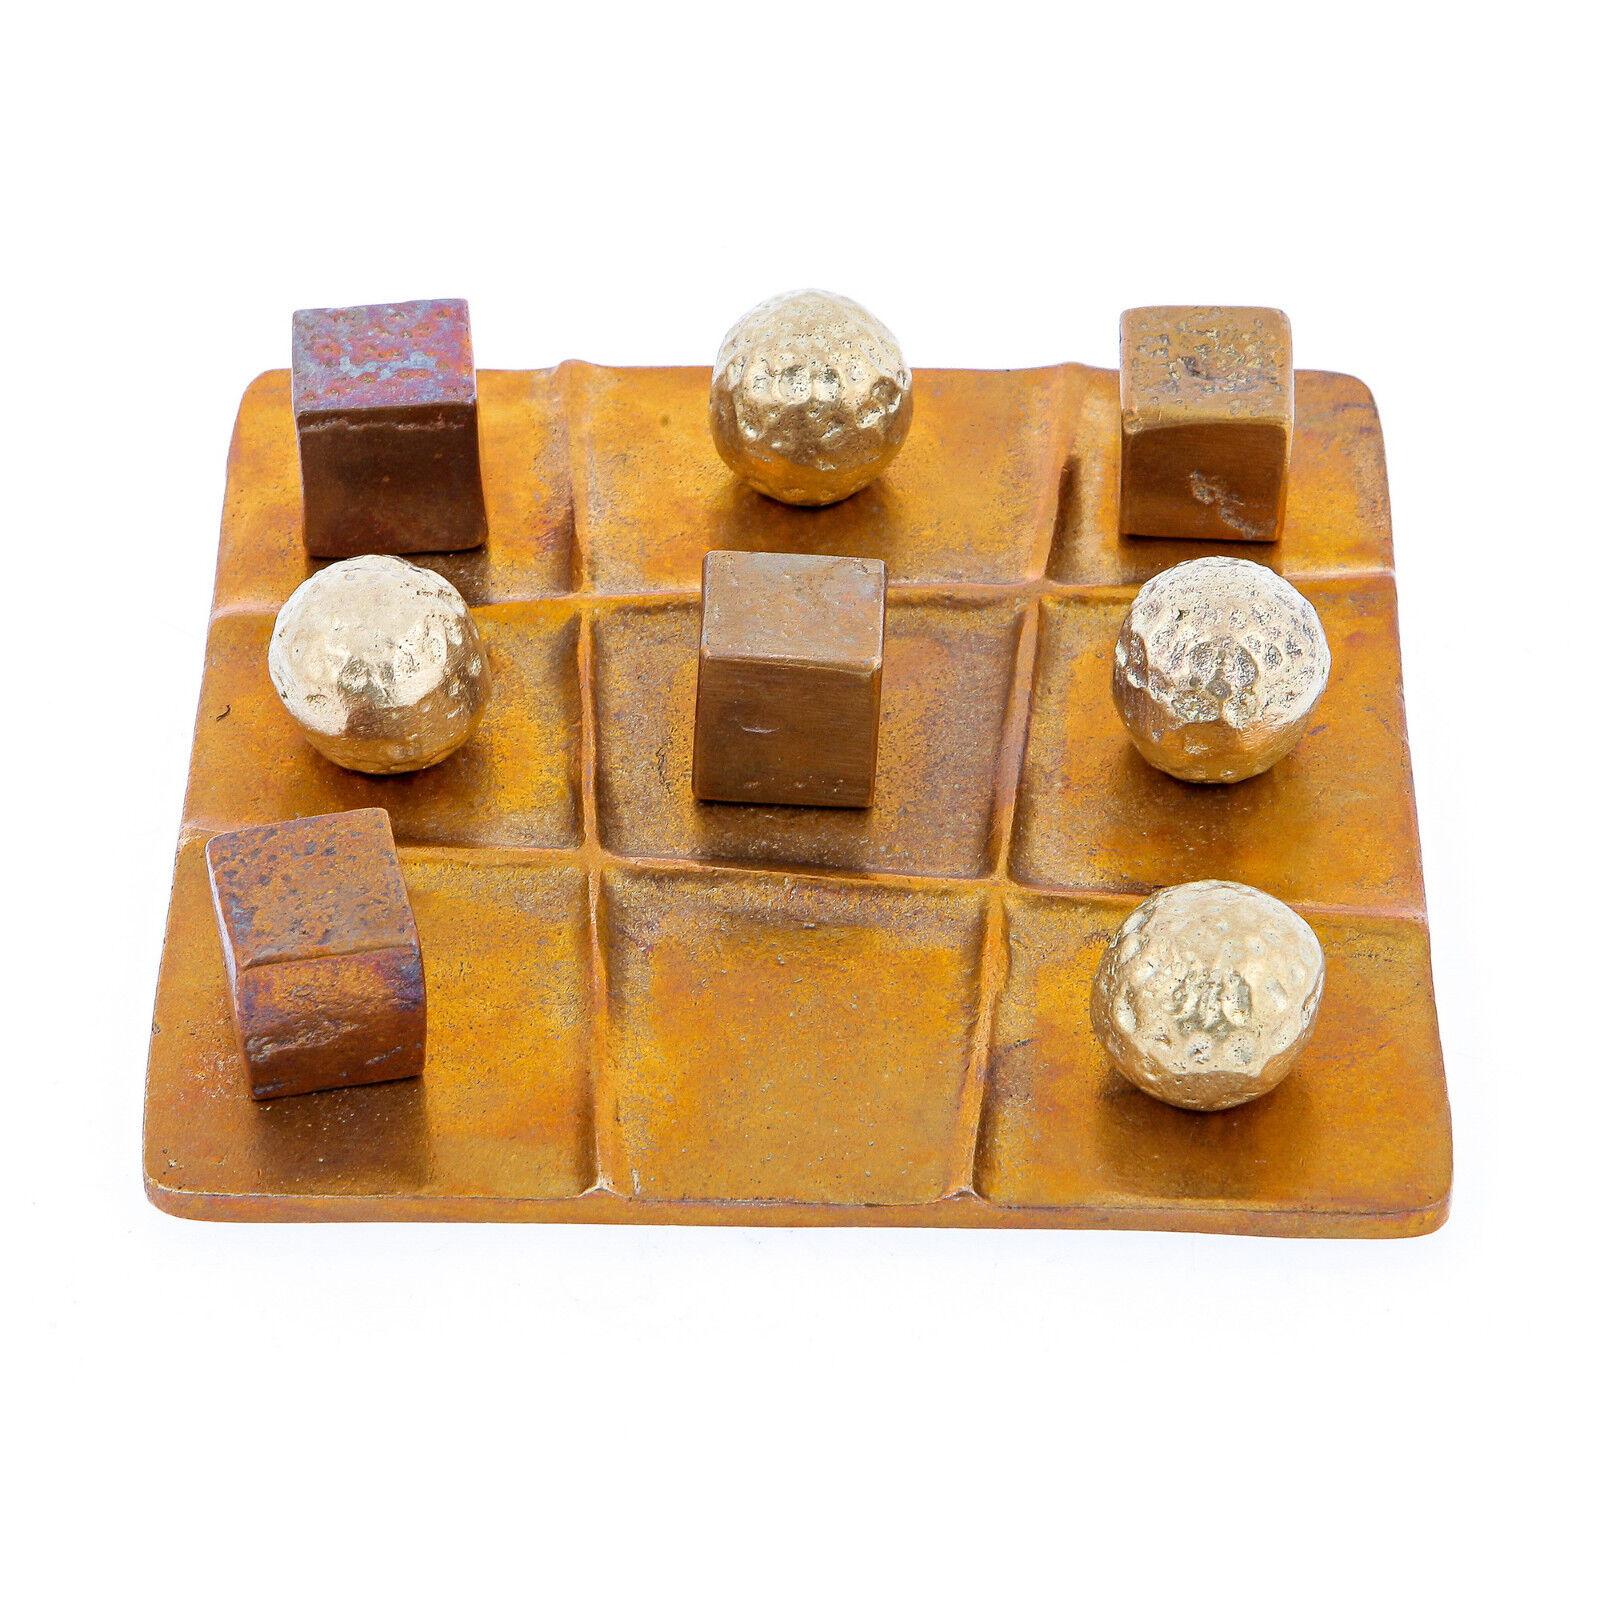 Tic Tac Toe Decorative Board Game - Handmade Solid Bronze - Table top Decor